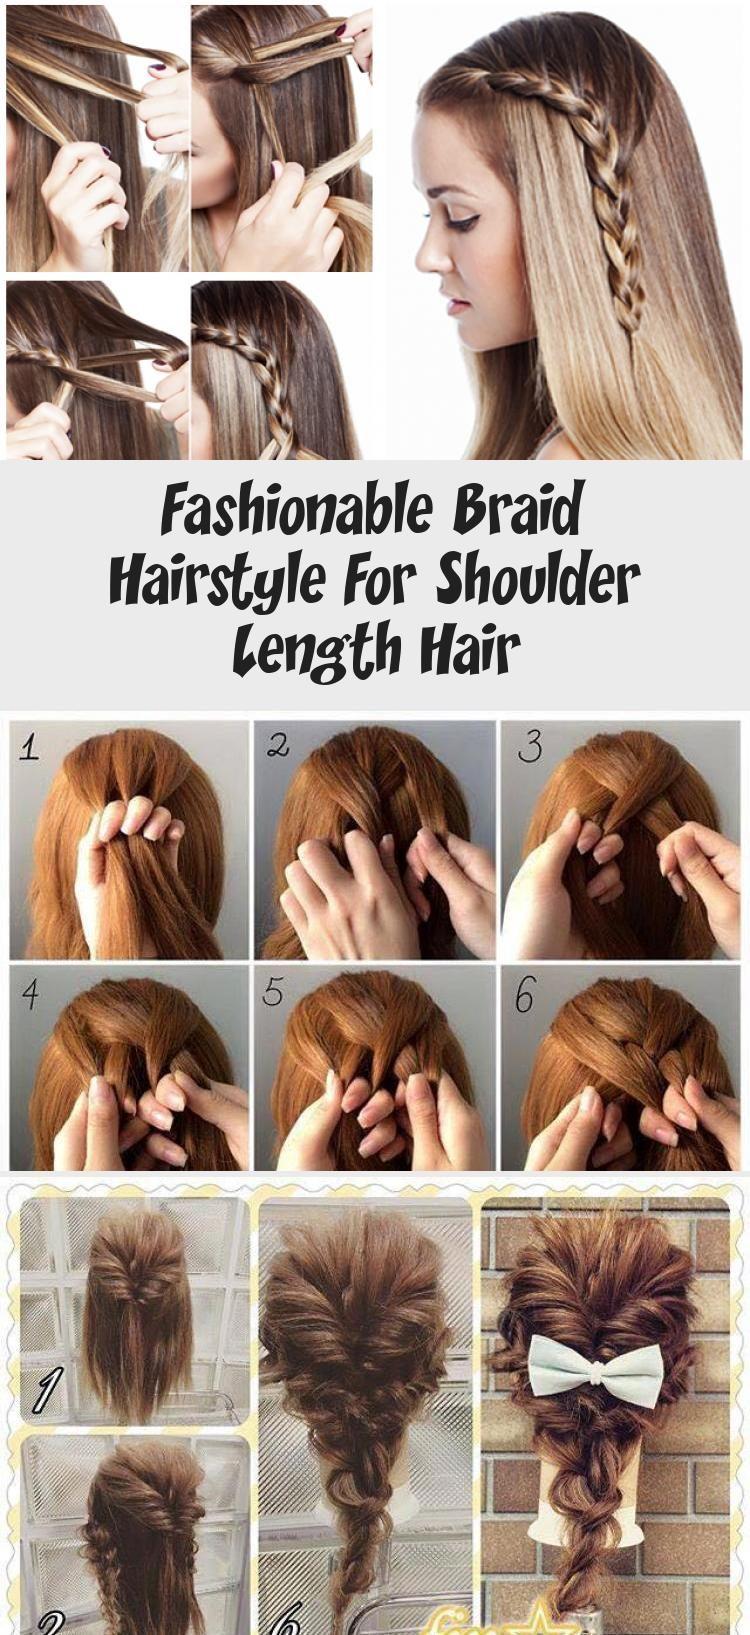 Fashionable Braid Hairstyle For Shoulder Length Hair - Hair Styles - Hair Style Ideas